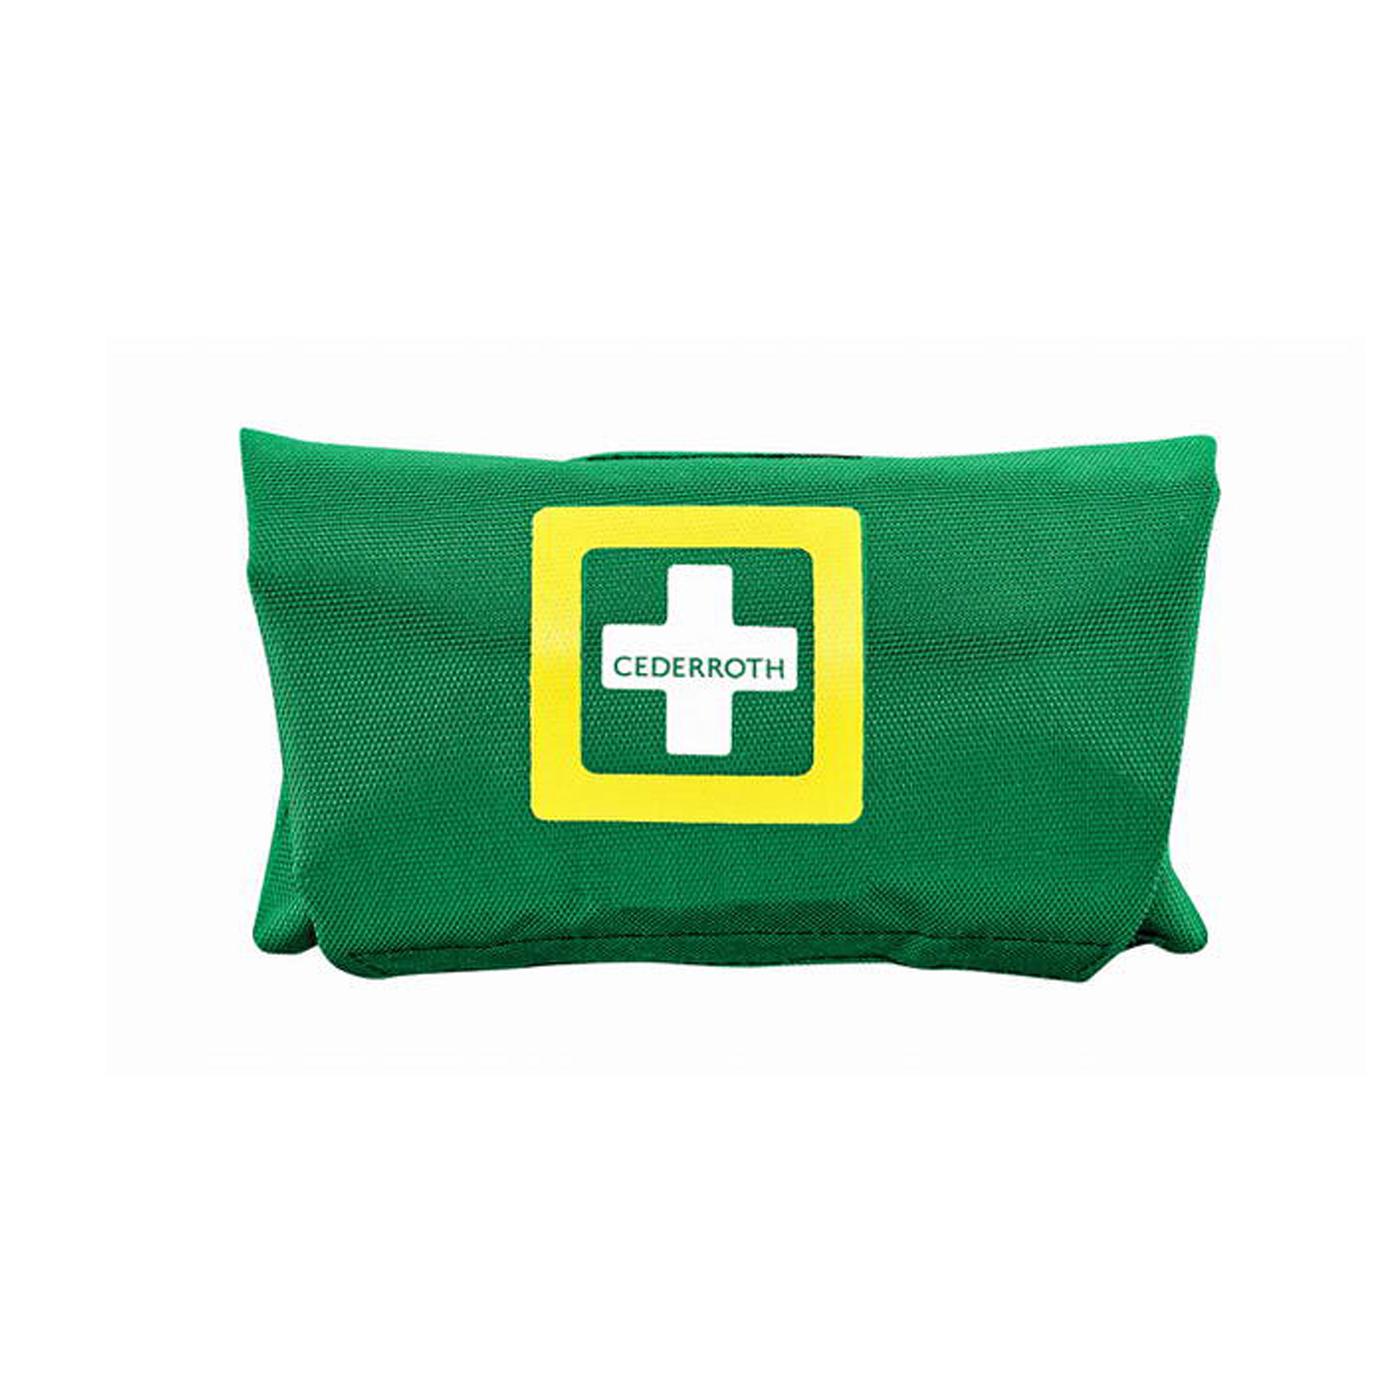 Apteczka Cederroth First Aid Kit Small, 390100